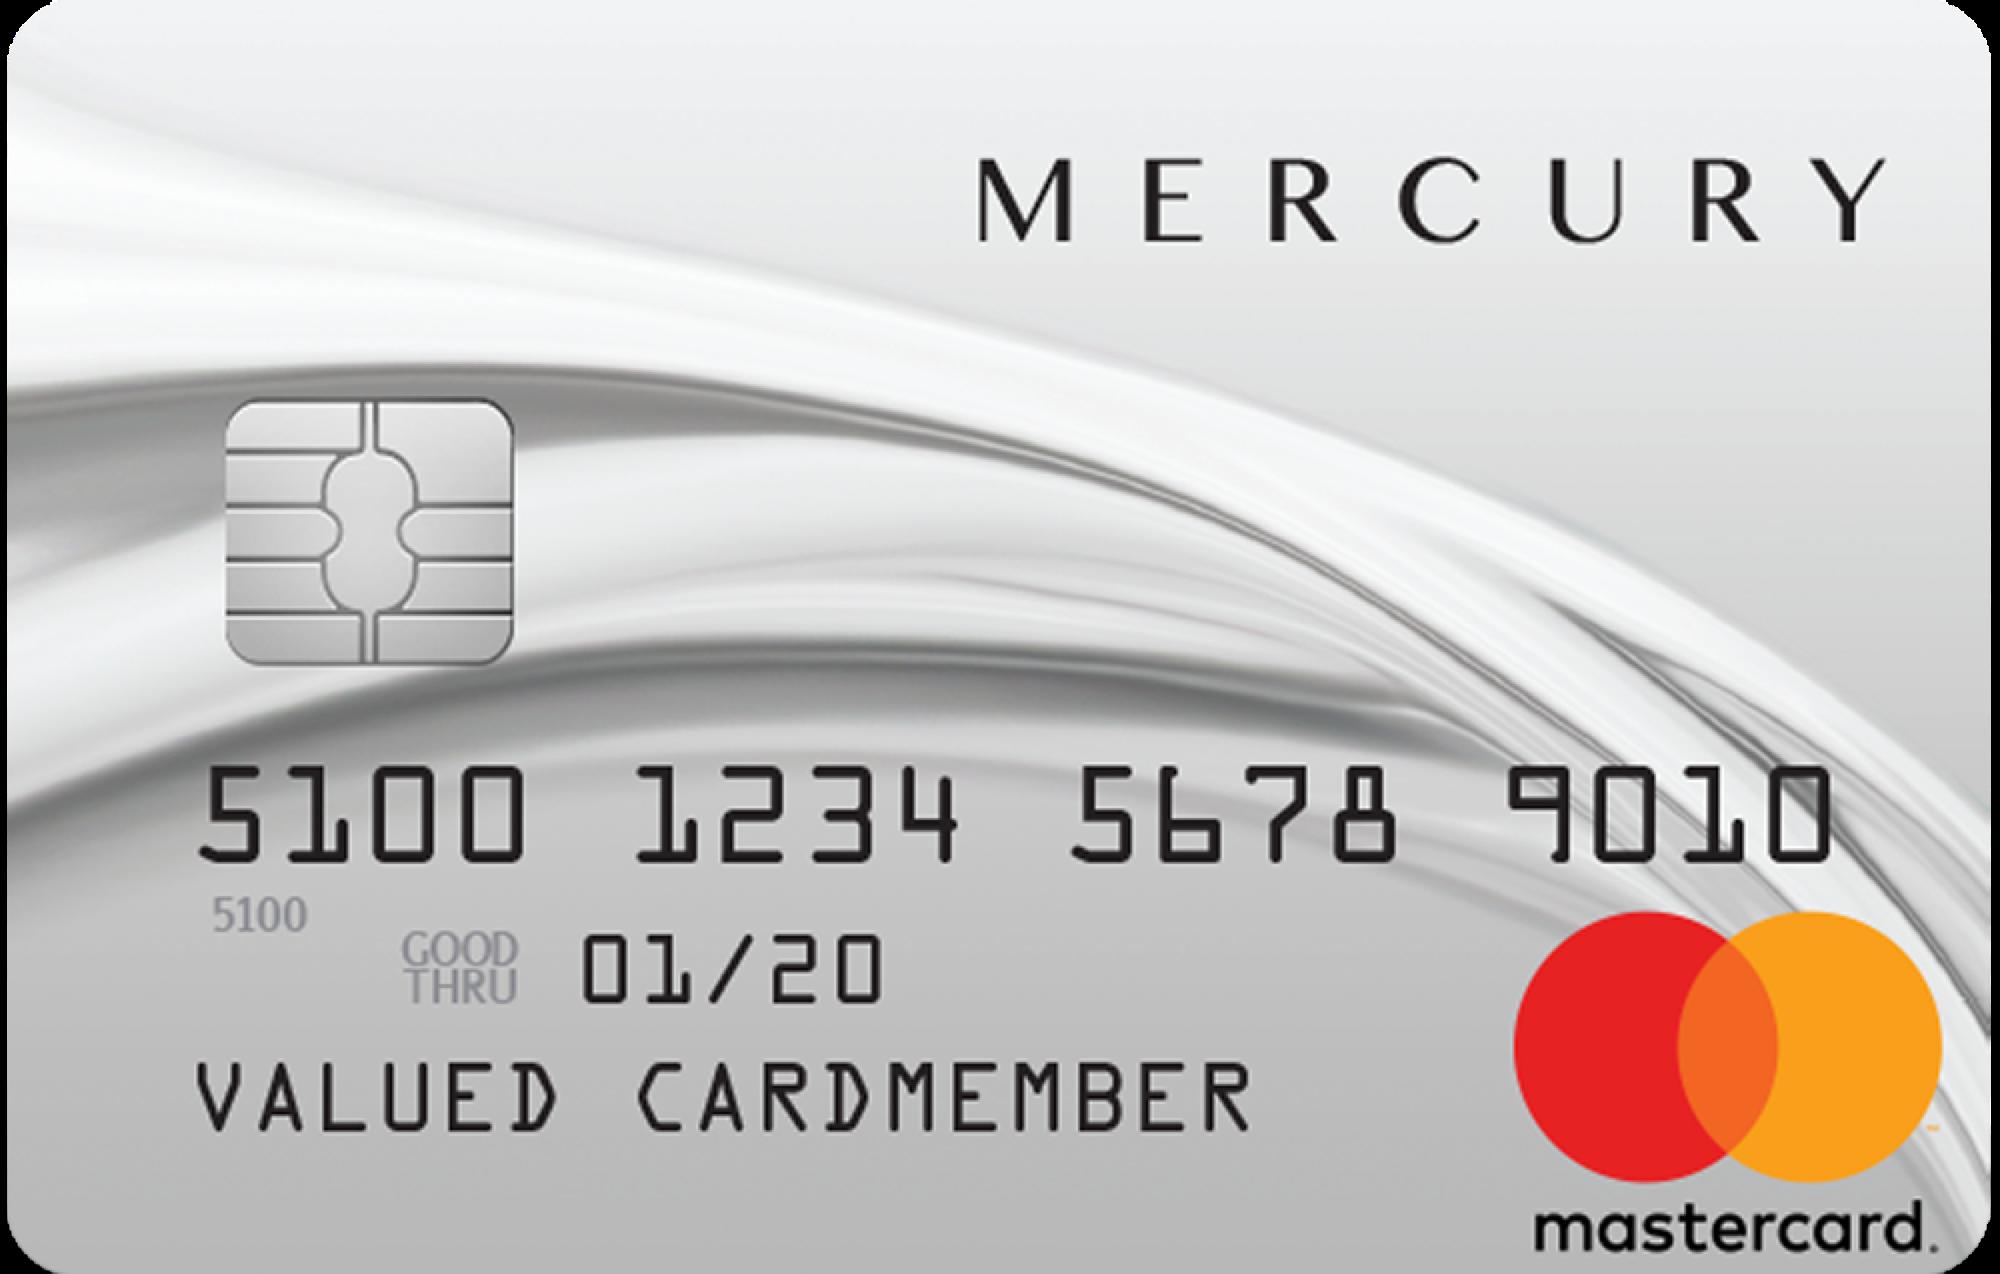 Mercury Mastercard®